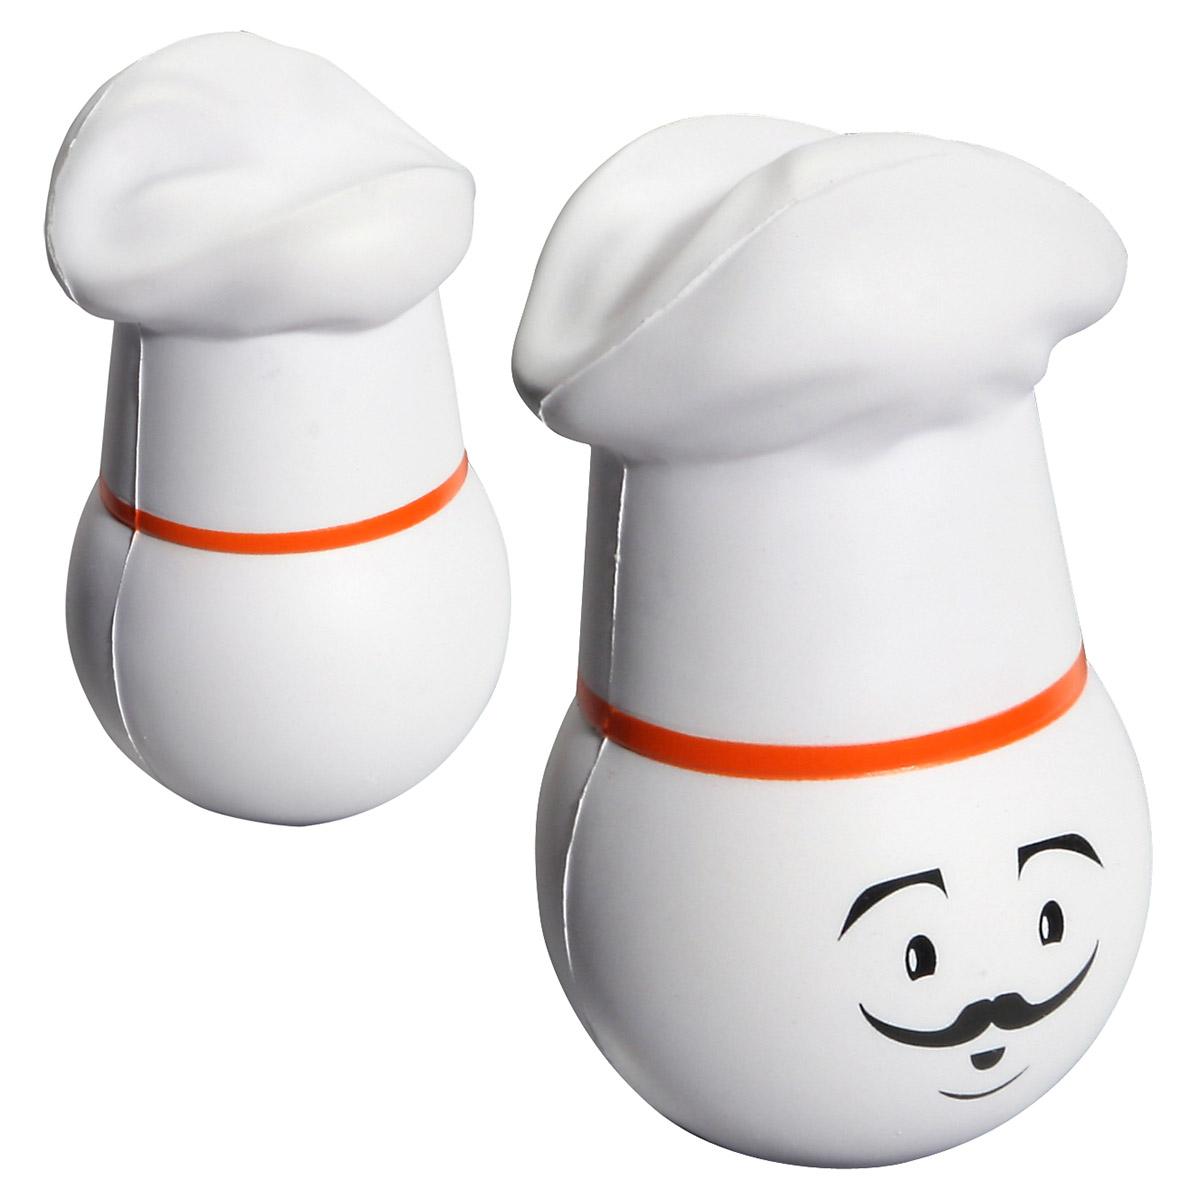 Chef Mad Cap Stress Reliever, LMA-CH09 - 1 Colour Imprint